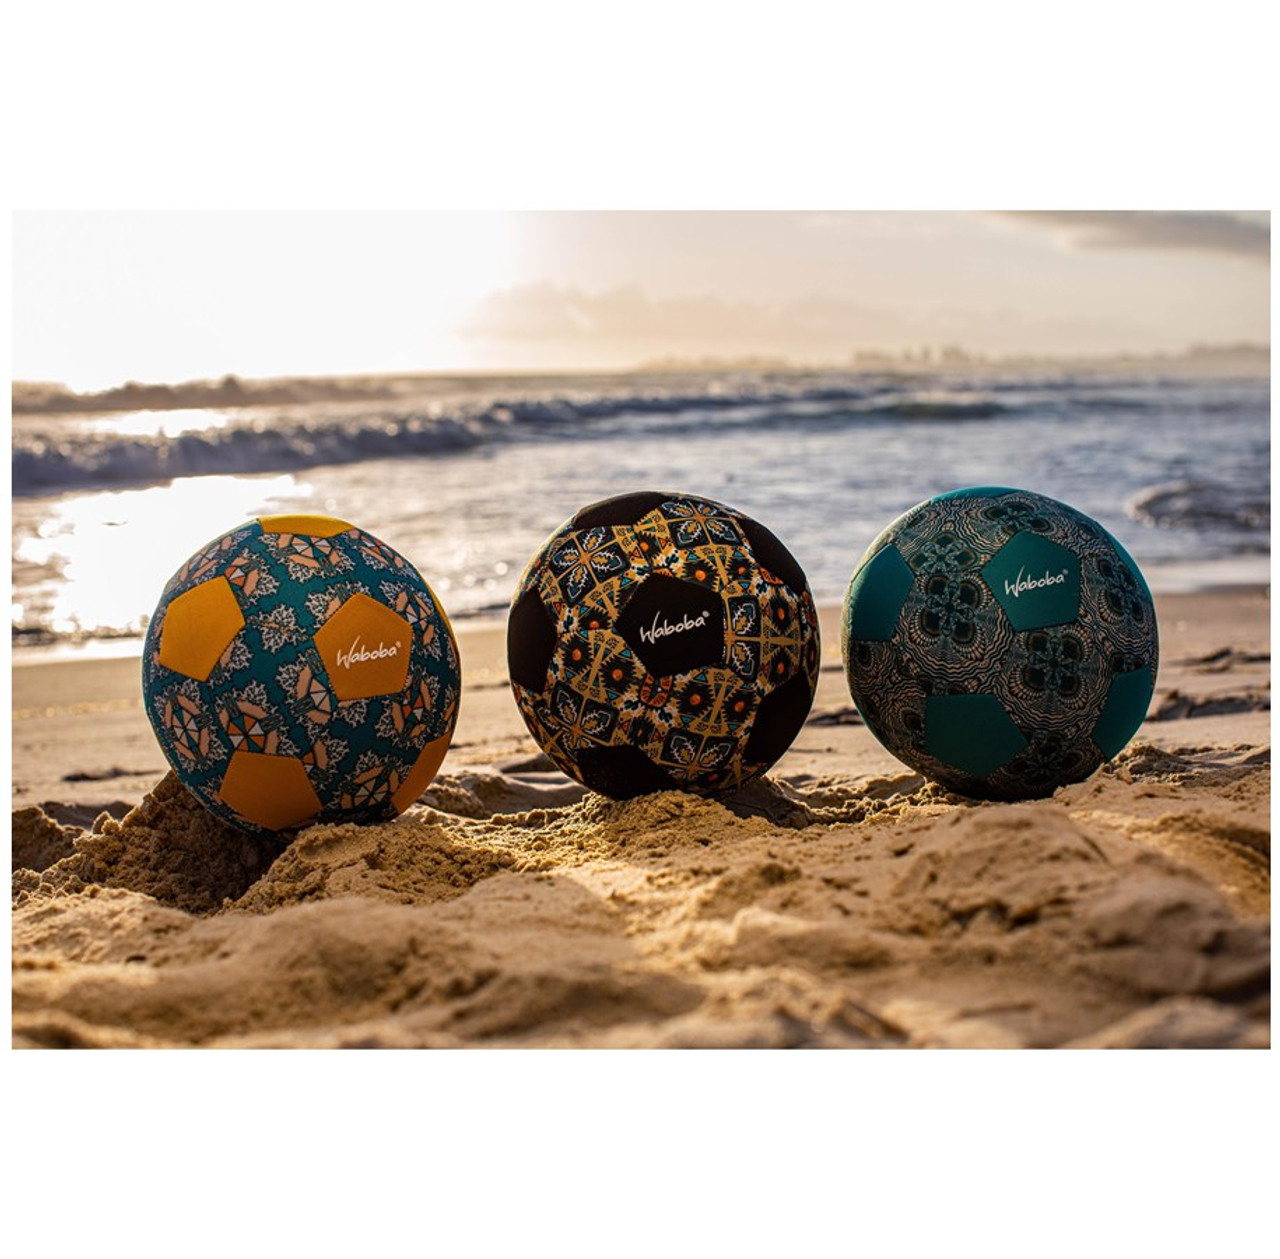 WABOBA MINI BEACH SOCCER BALL